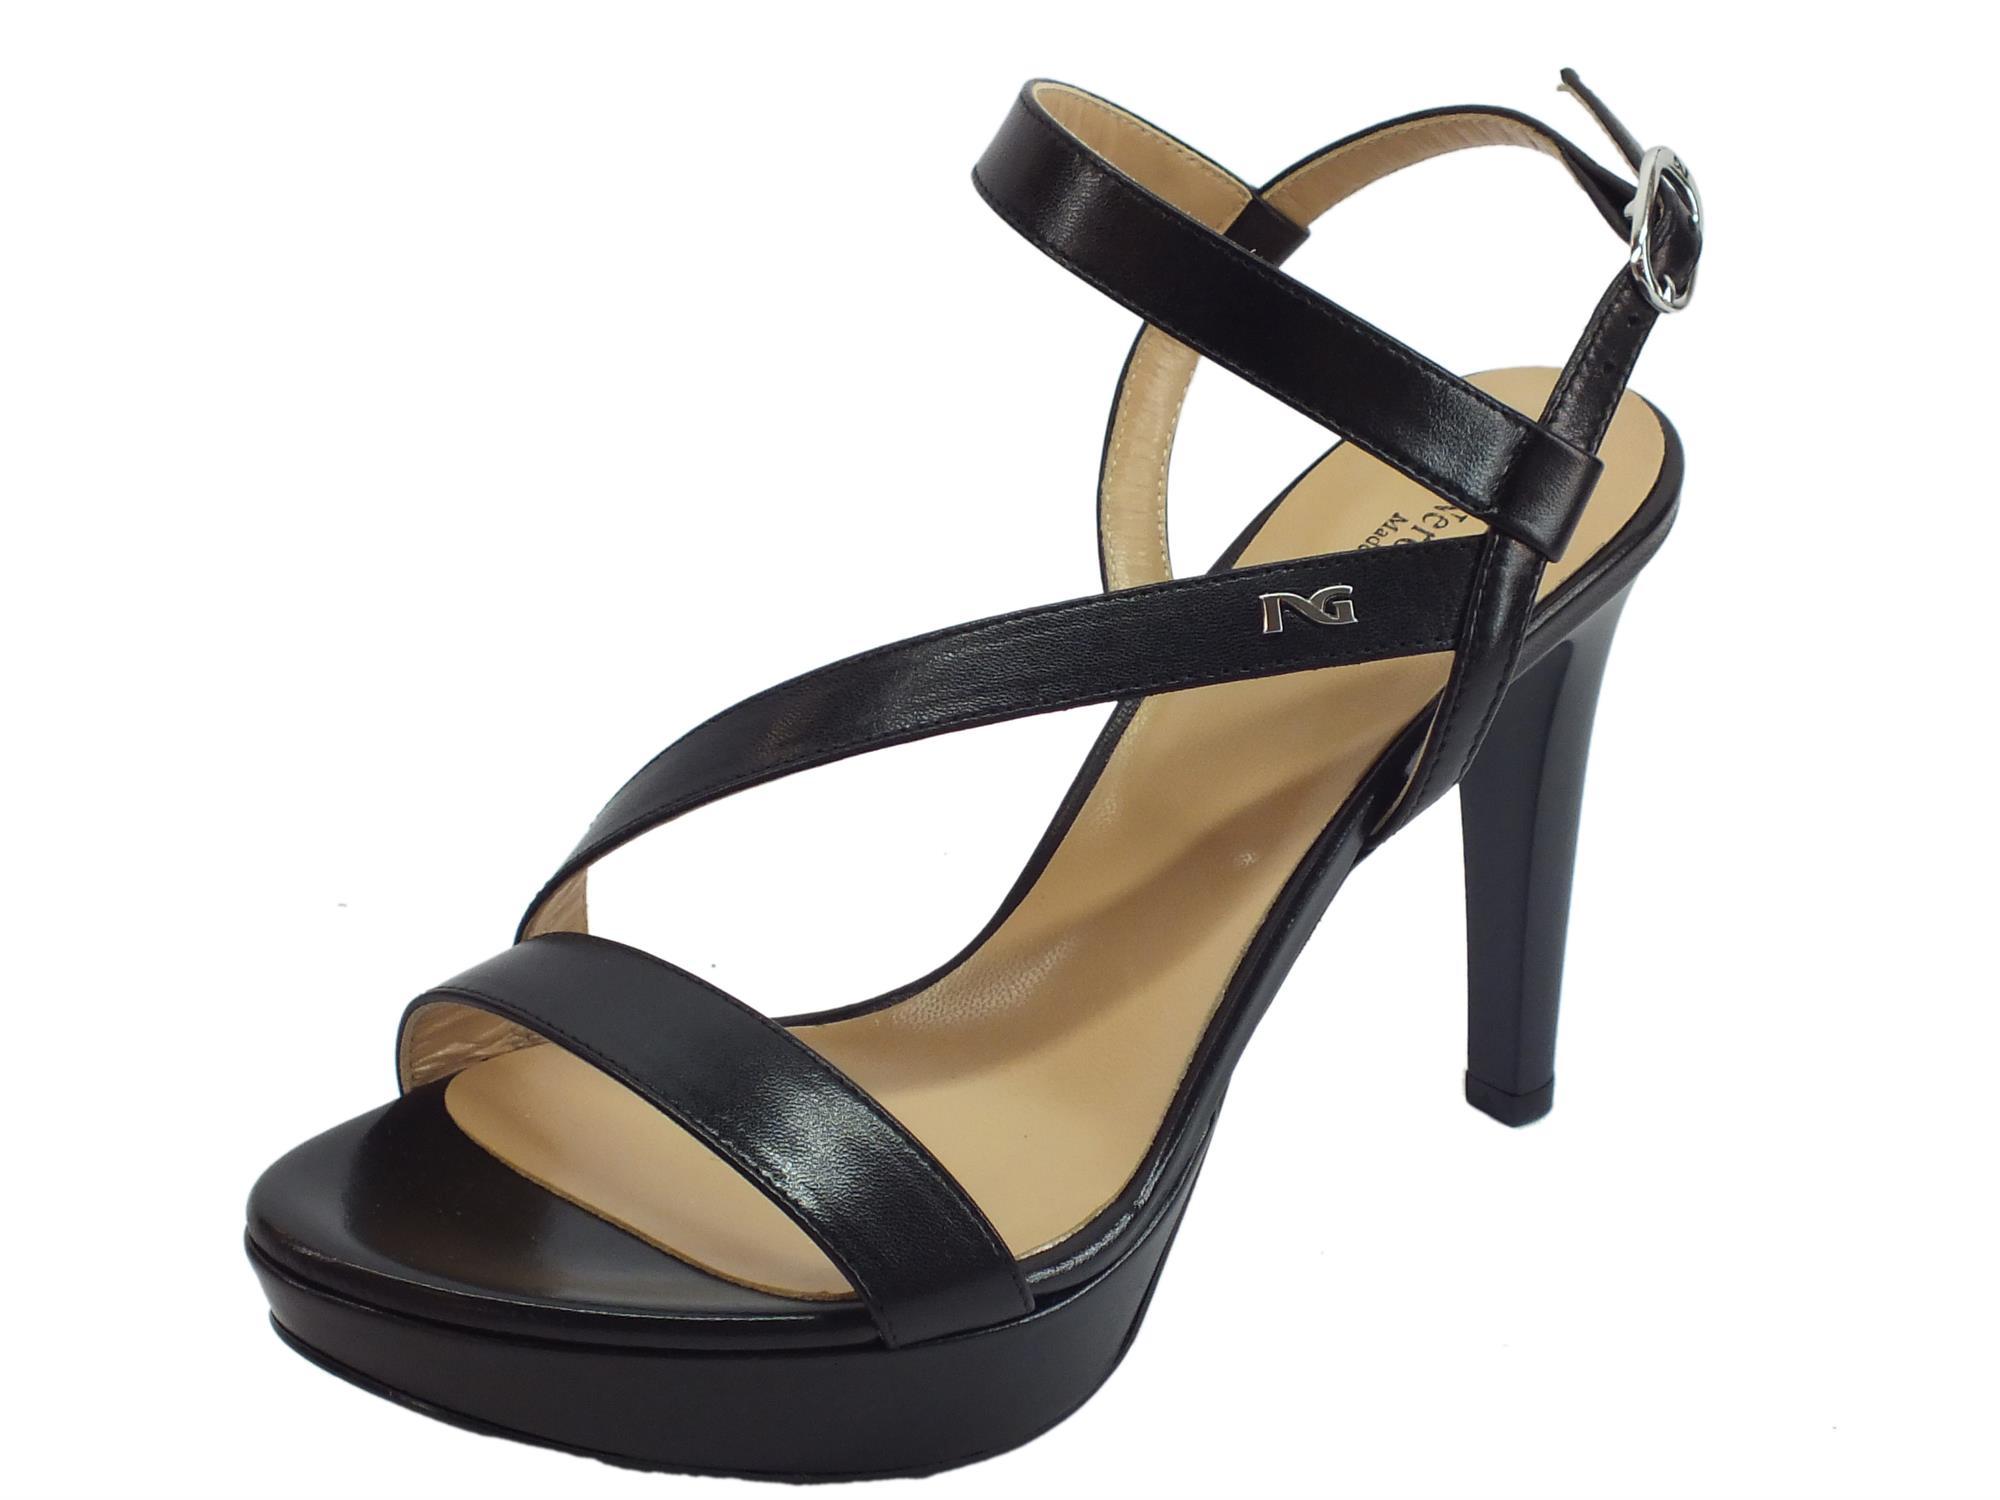 Sandali Nero Giardini in vera pelle | Sara P. Shoes